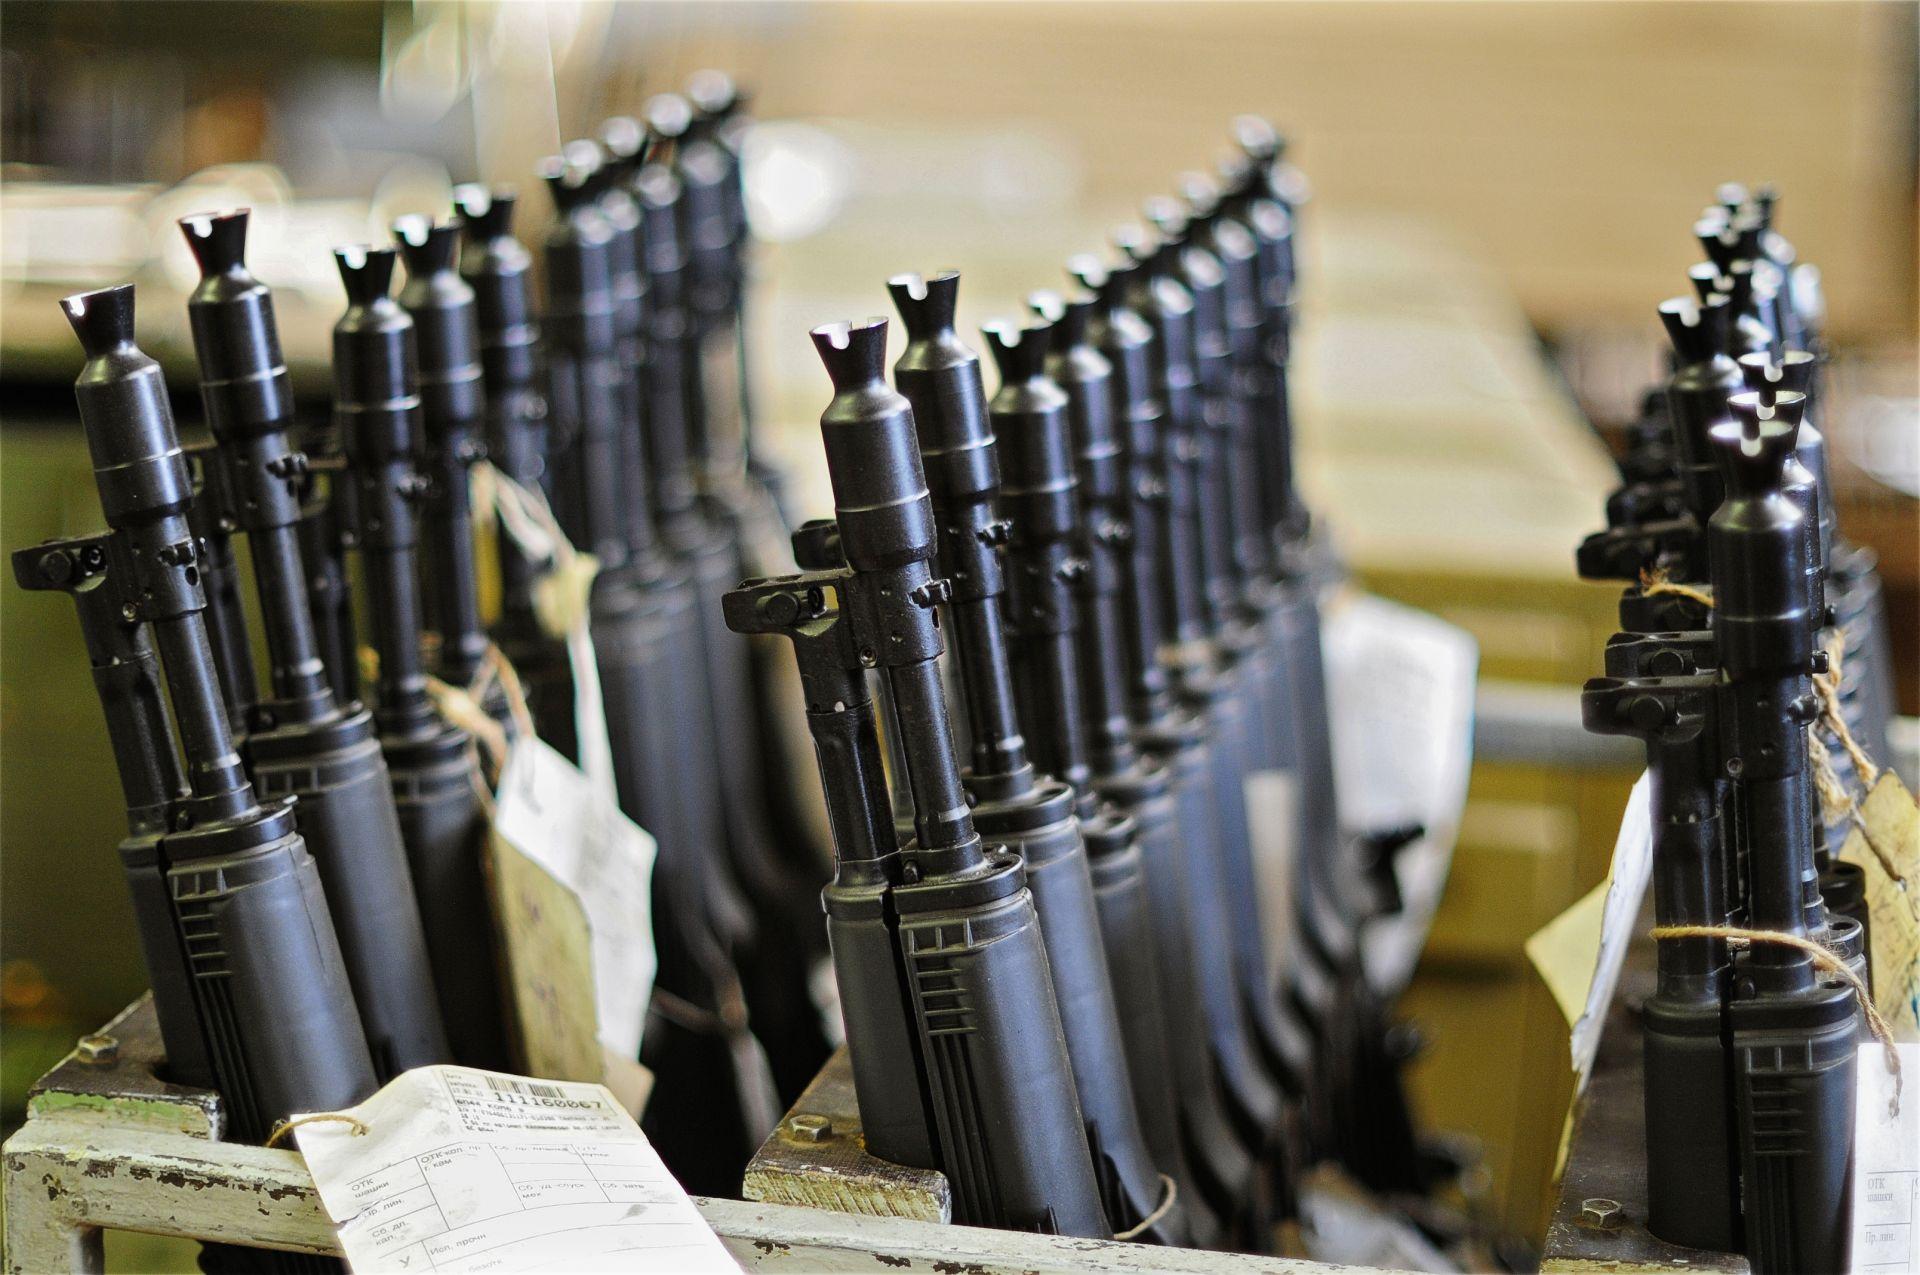 FOTO: Perusahaan Raksasa Rusia, Kisah Nyata Senapan Tembak Kalashnikov